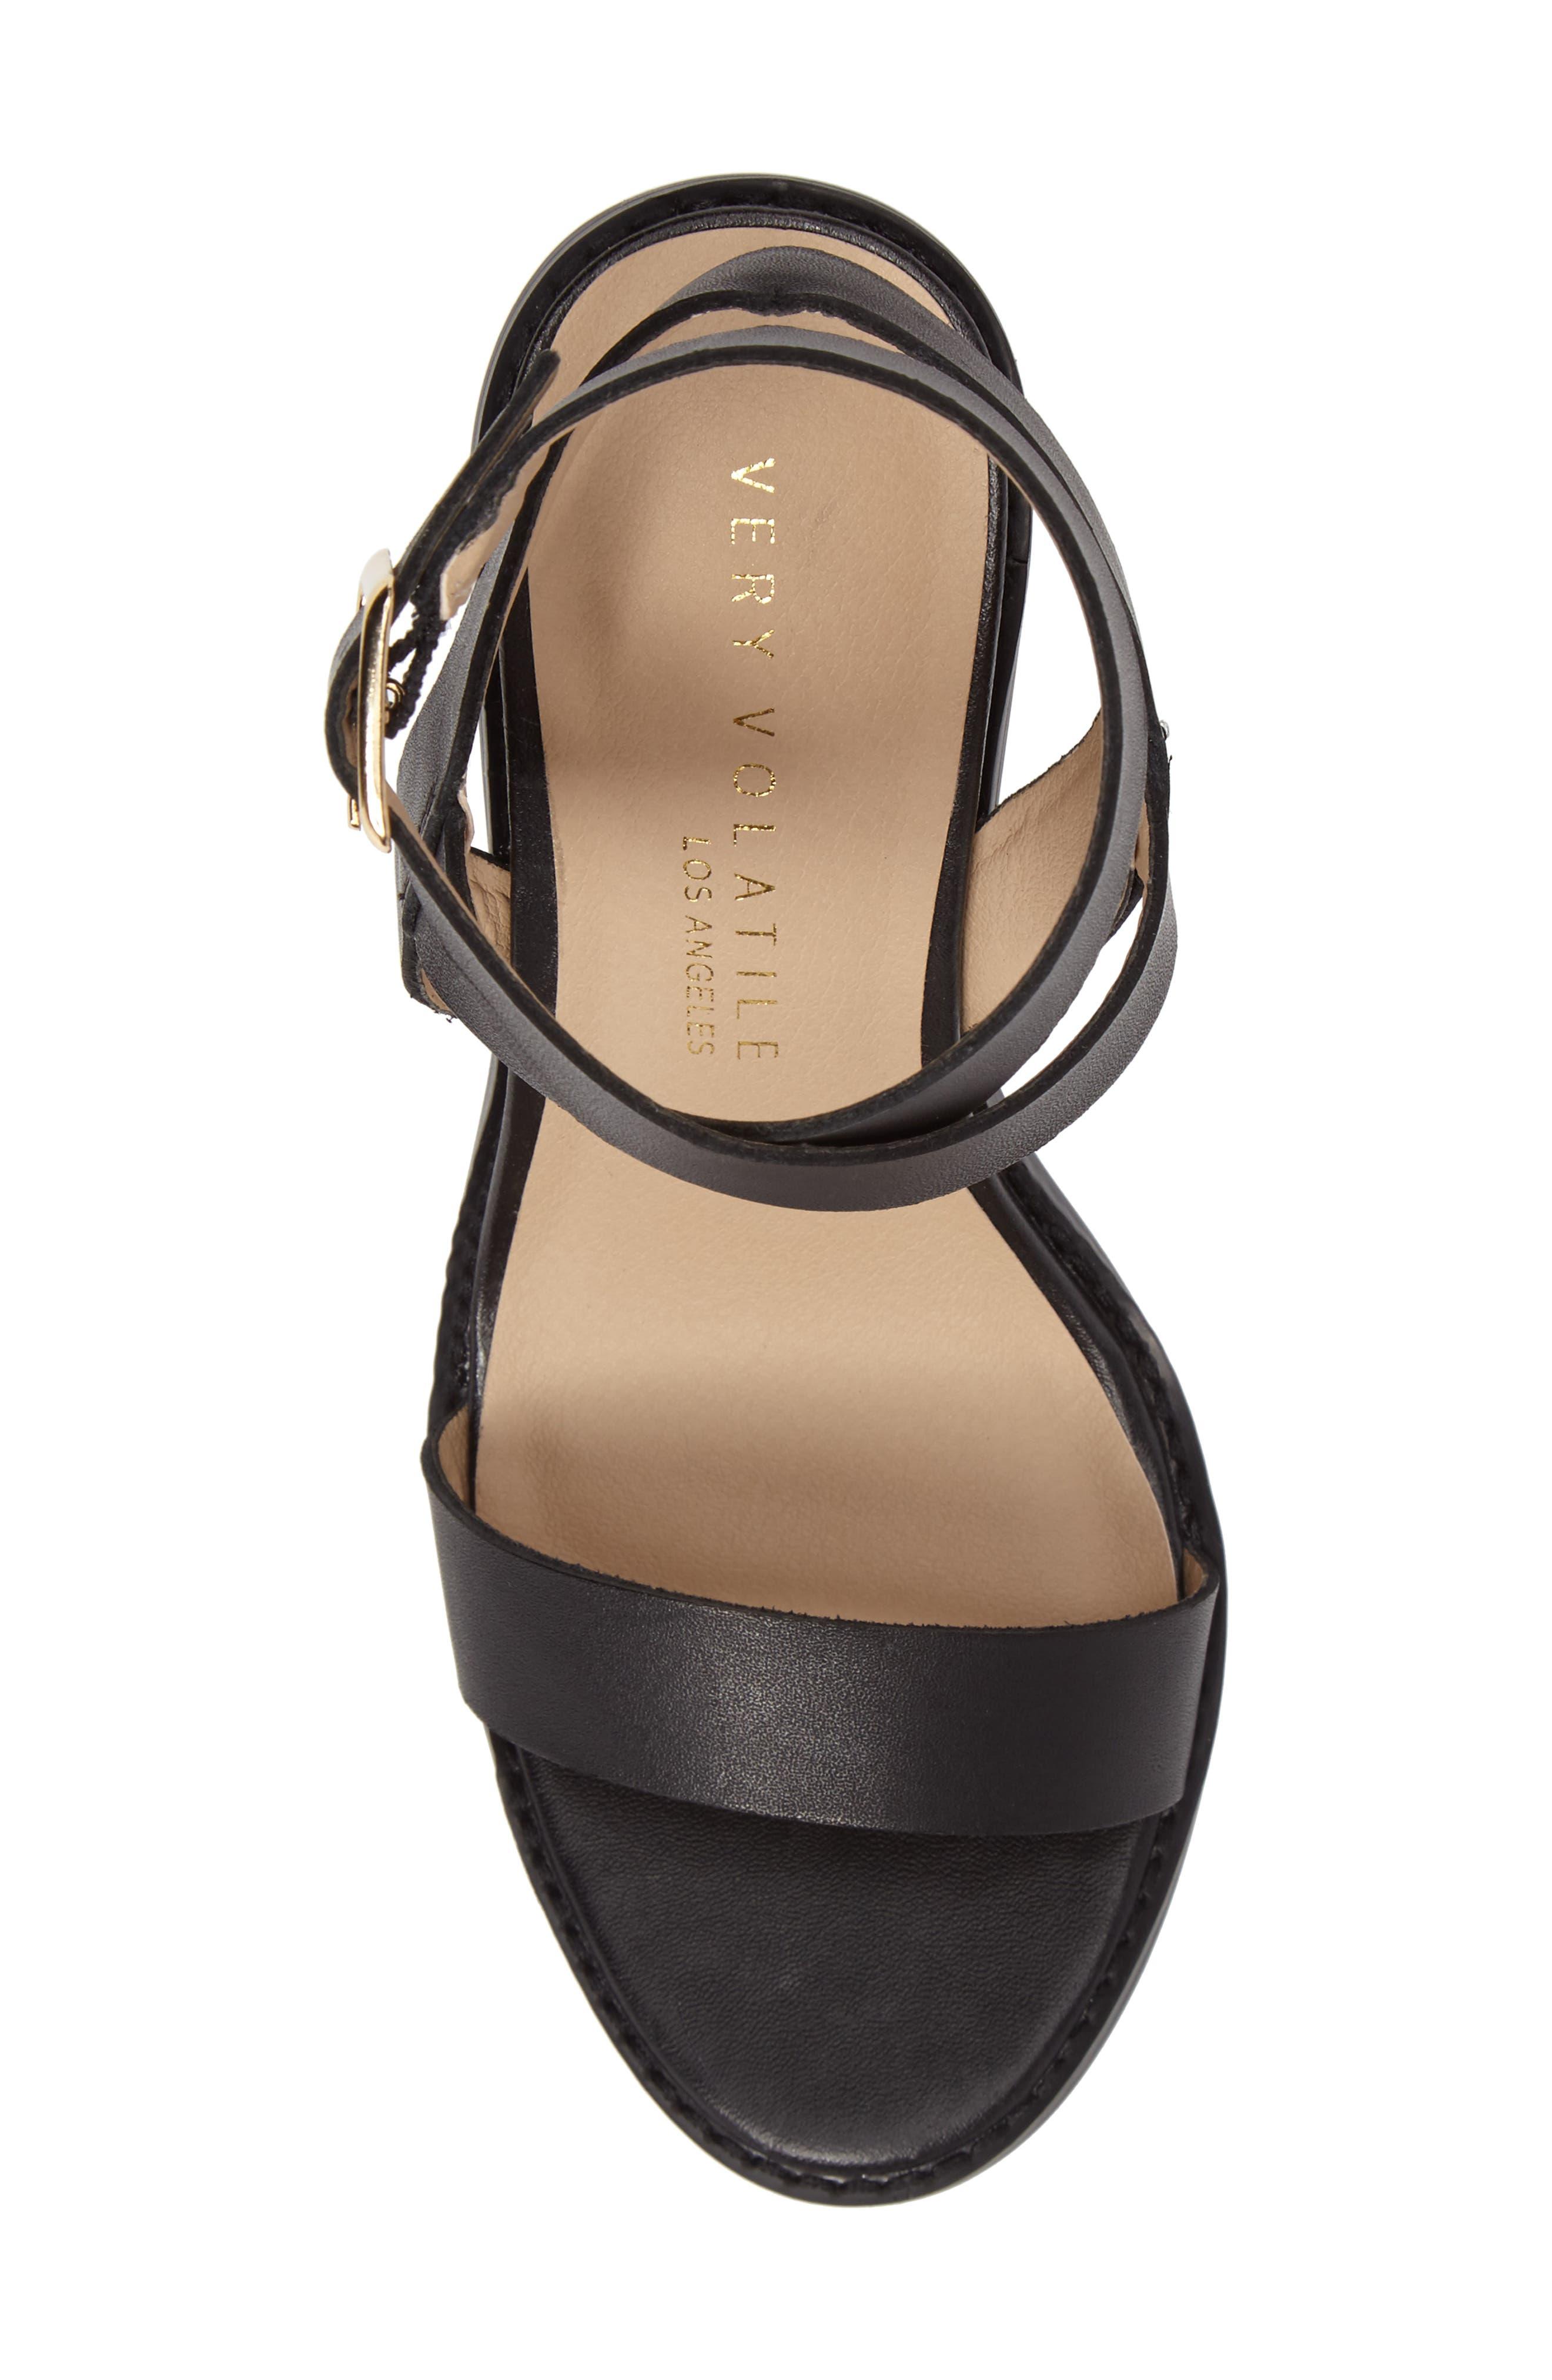 Poshy Ankle Wrap Sandal,                             Alternate thumbnail 5, color,                             BLACK LEATHER